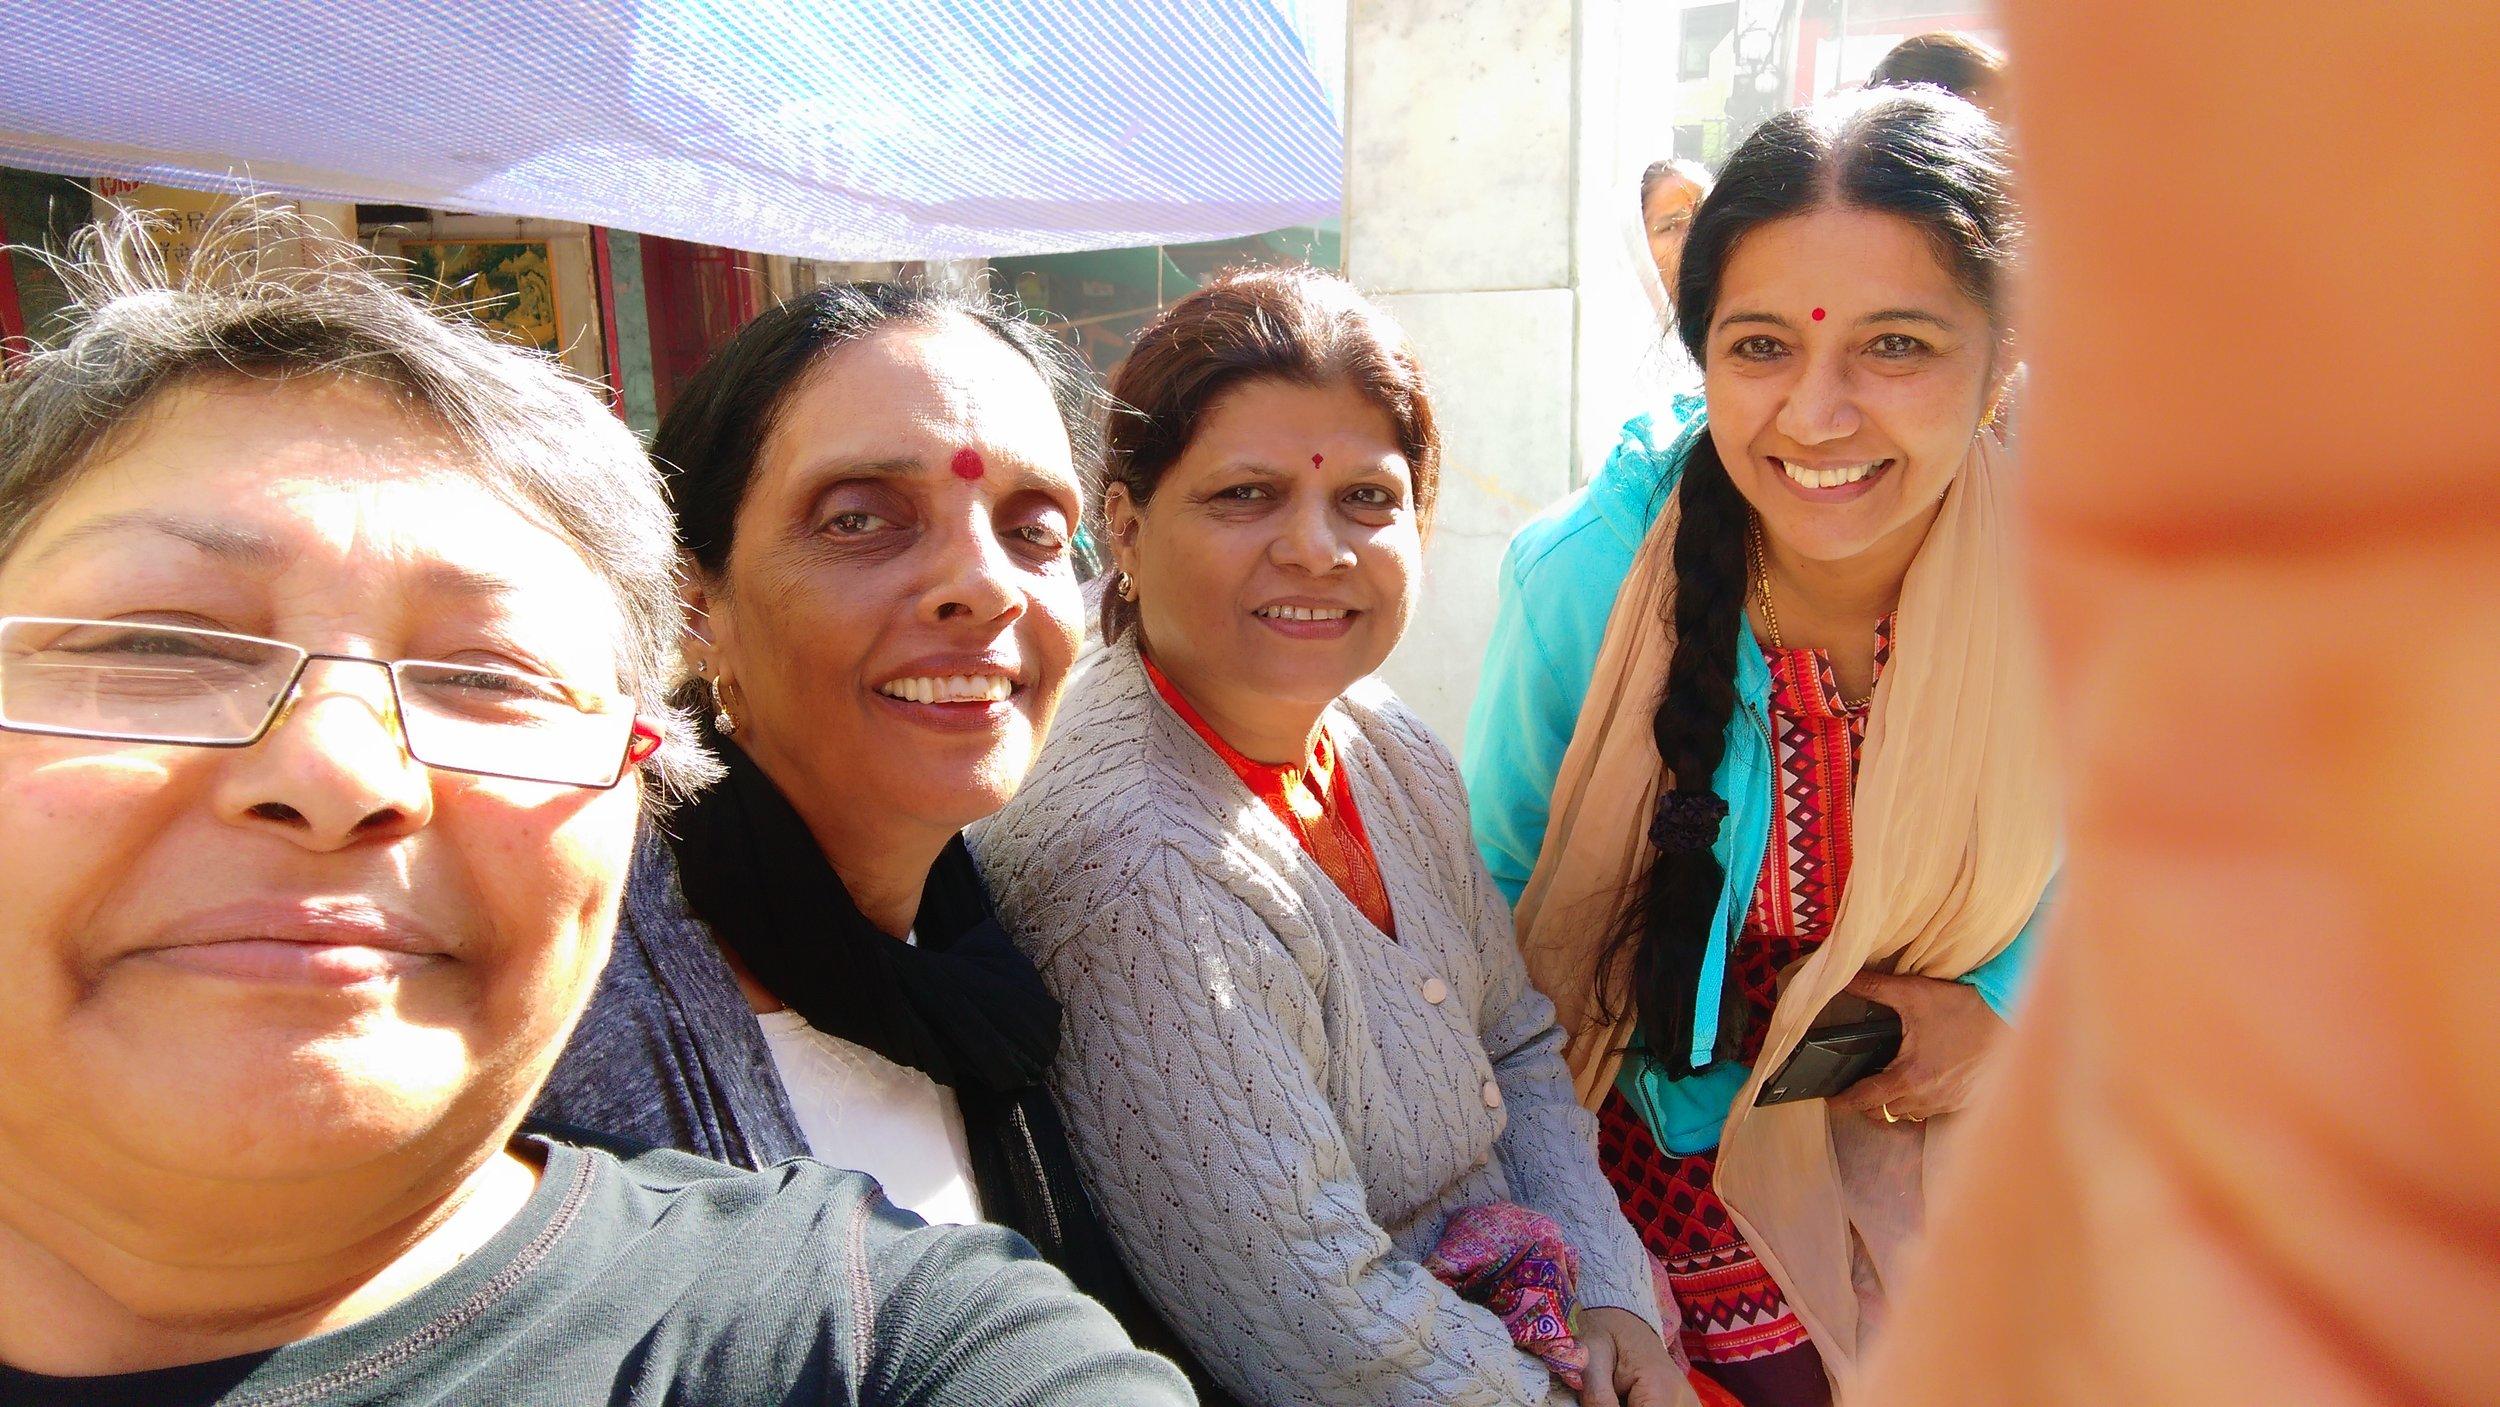 Schoolfriend selfie: Moi, Gouri, Shobha and Raji